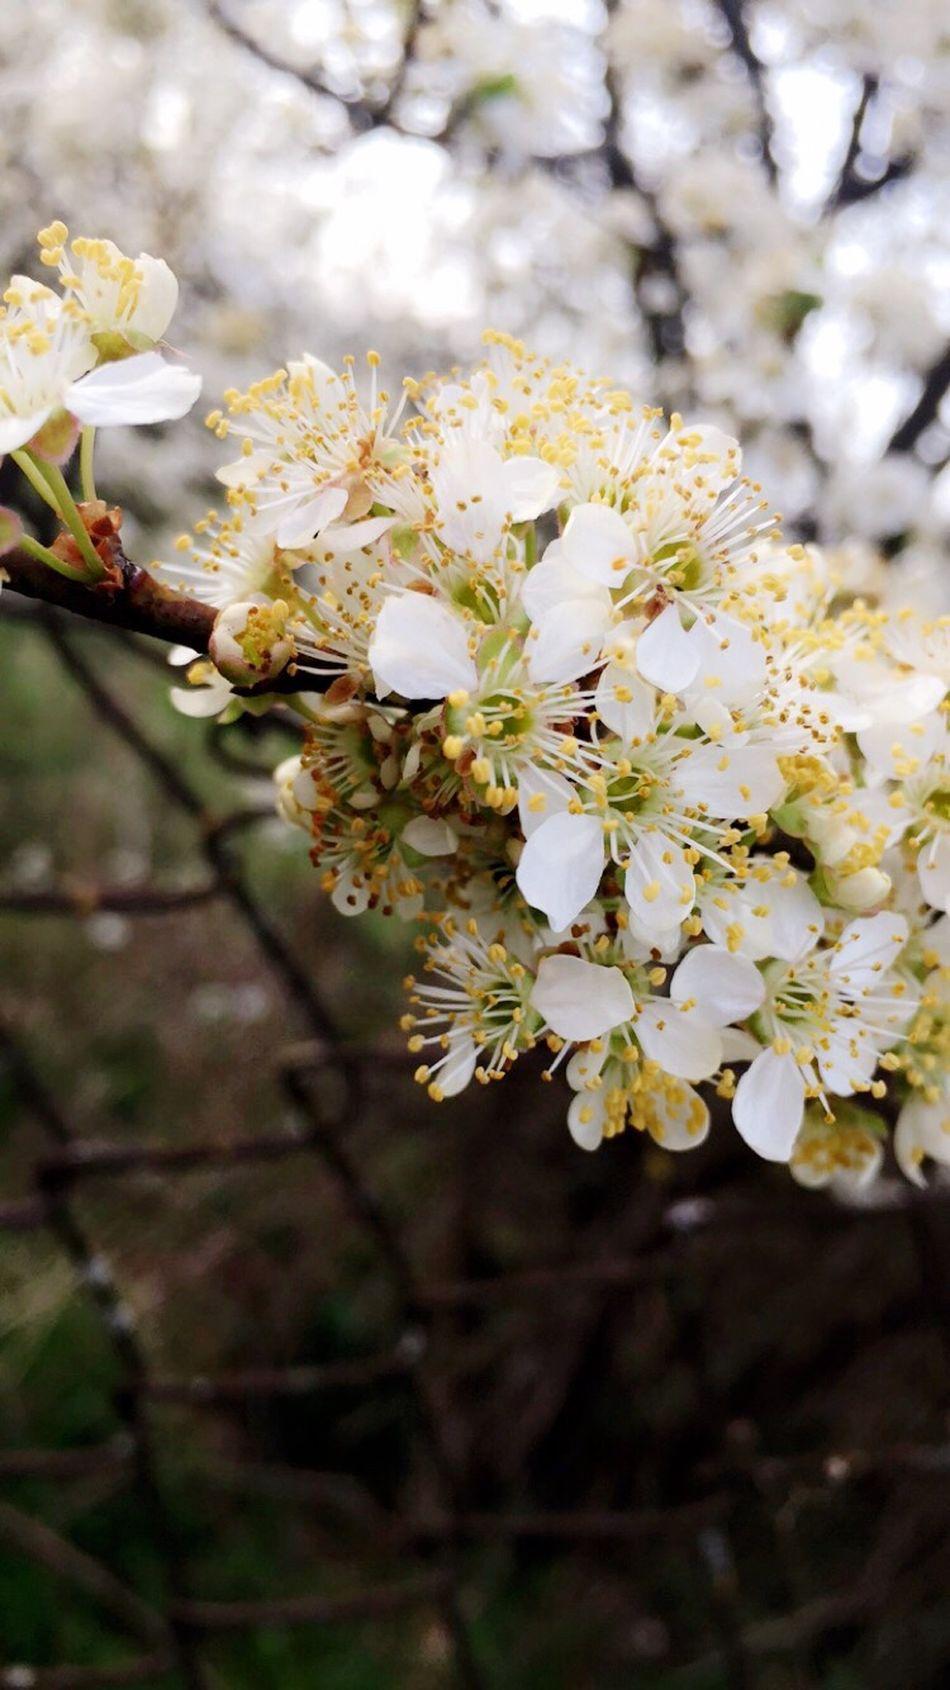 Adinafrasinphotography OpenEdit Spring Springtime Beautiful Beautiful Nature Outdoors Flowers Spring Flowers Photography White Flower White